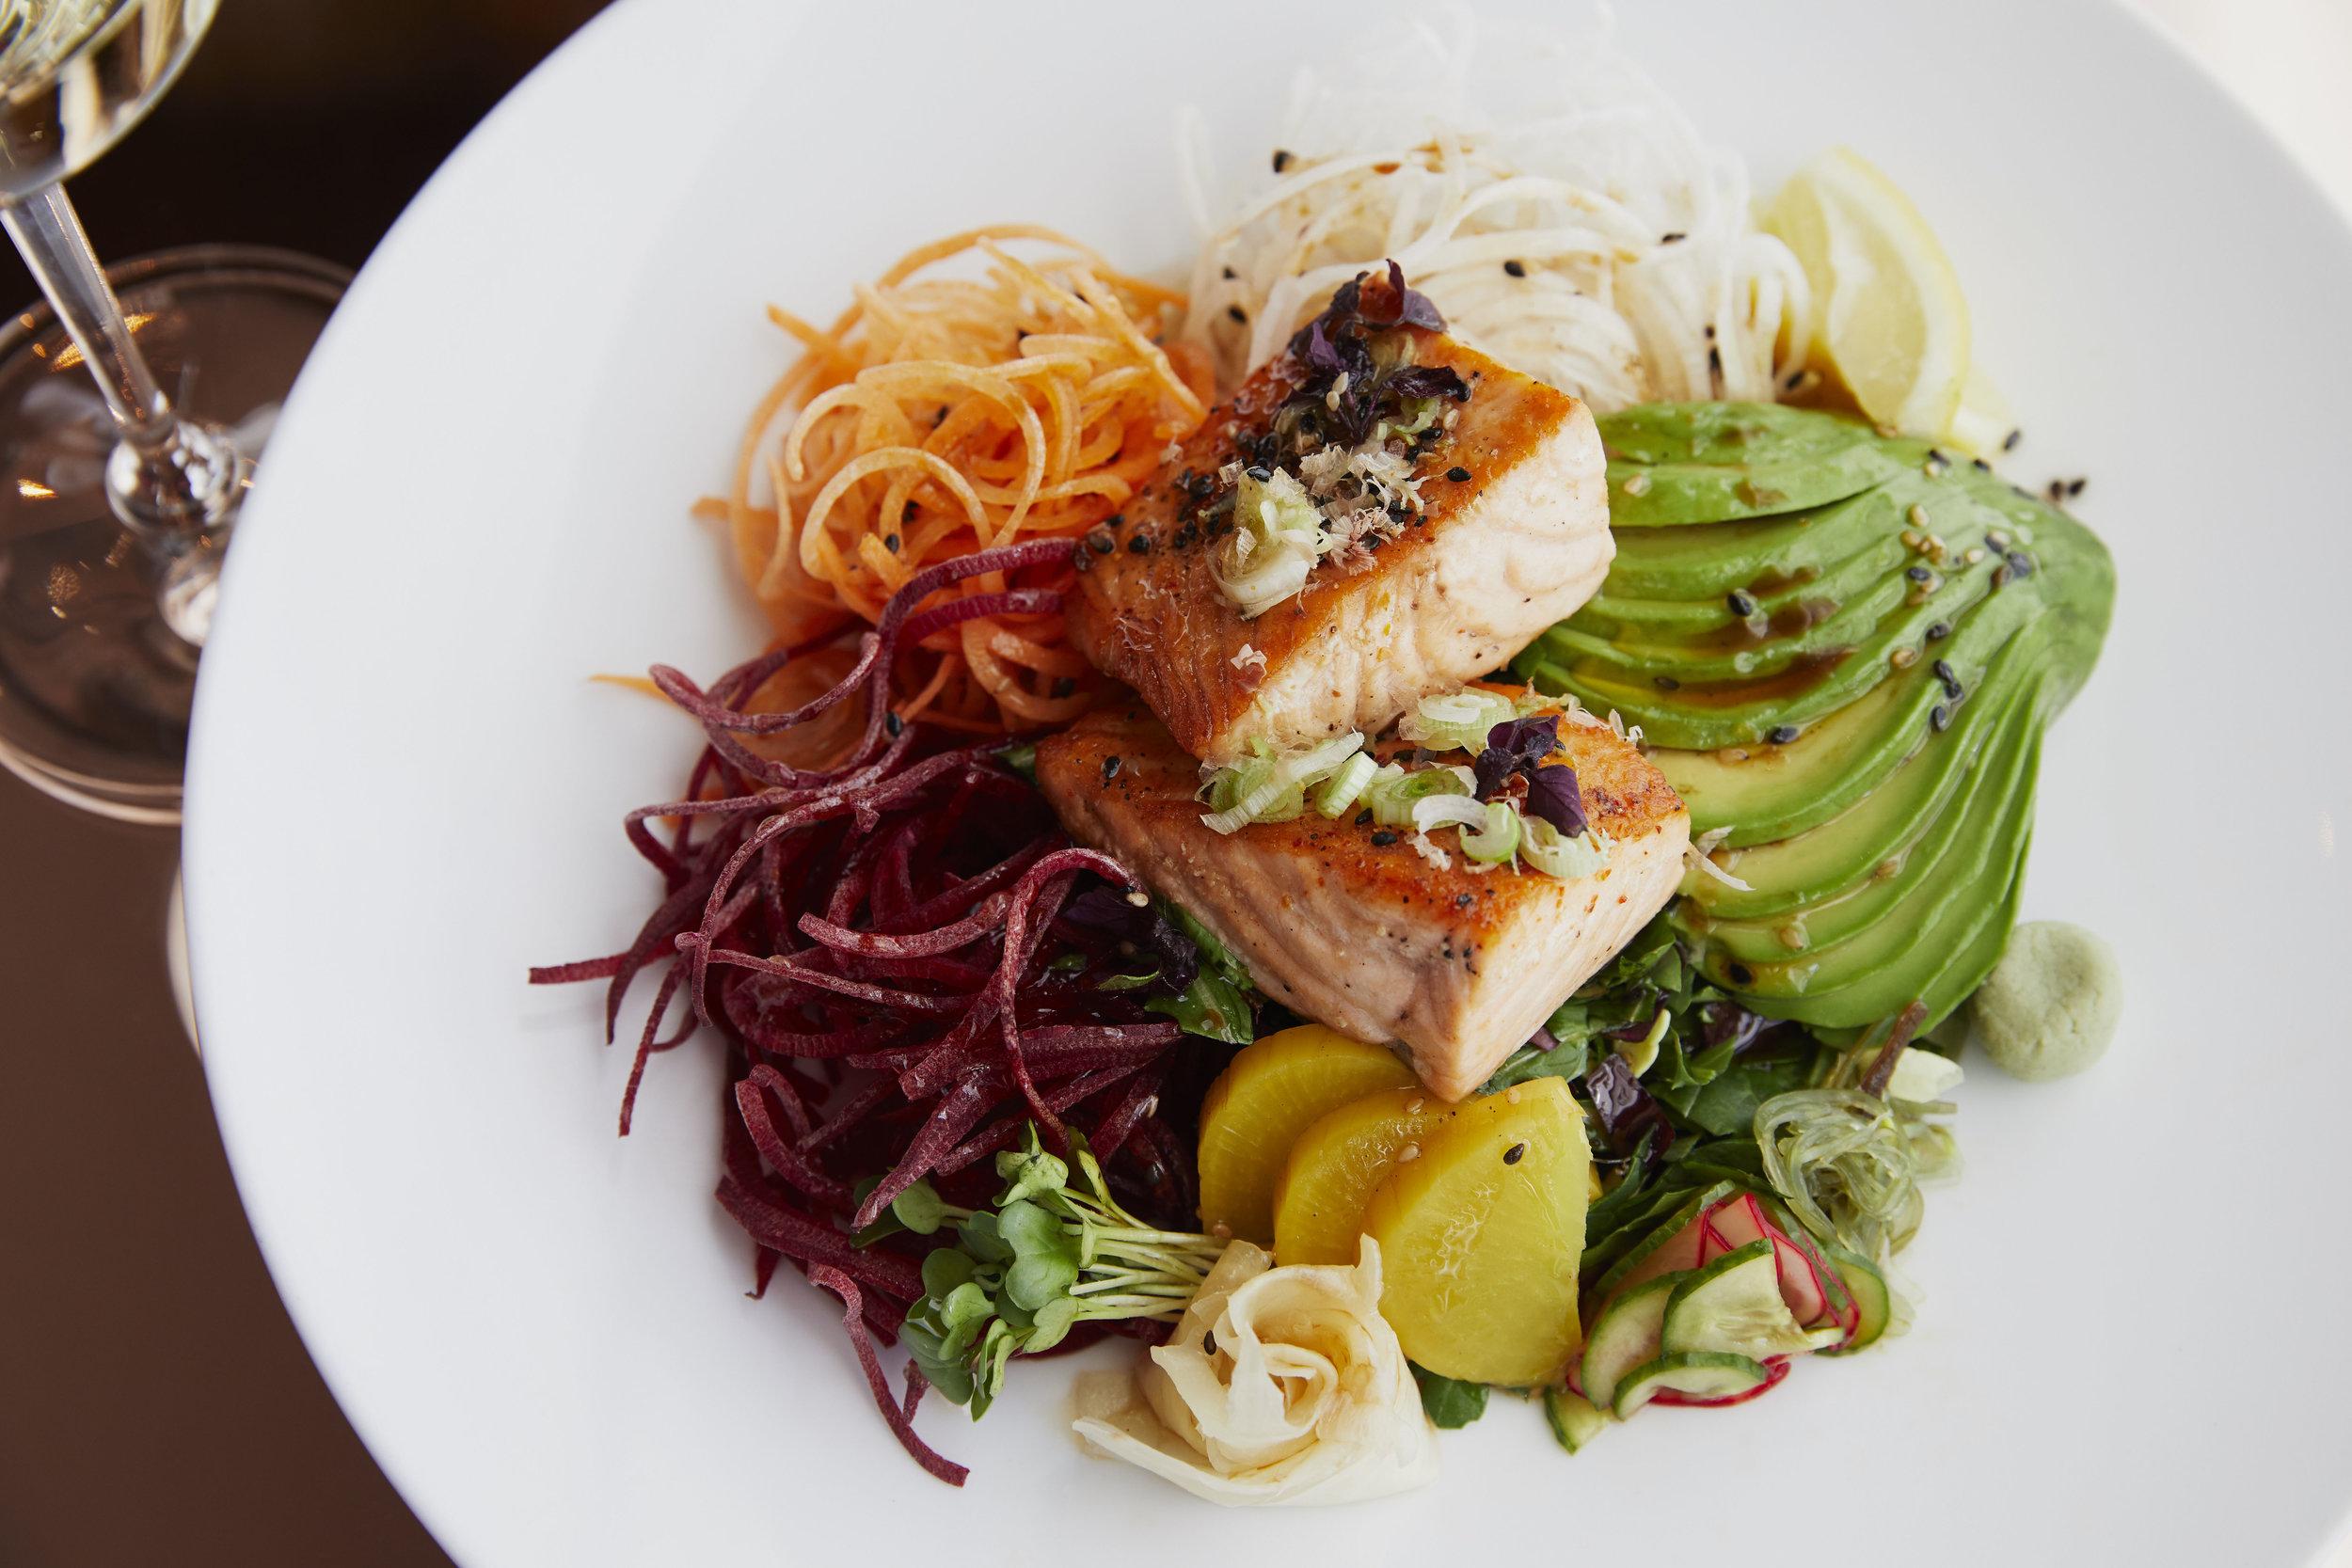 20190329-salmon-salad-323-hrj copy.jpg